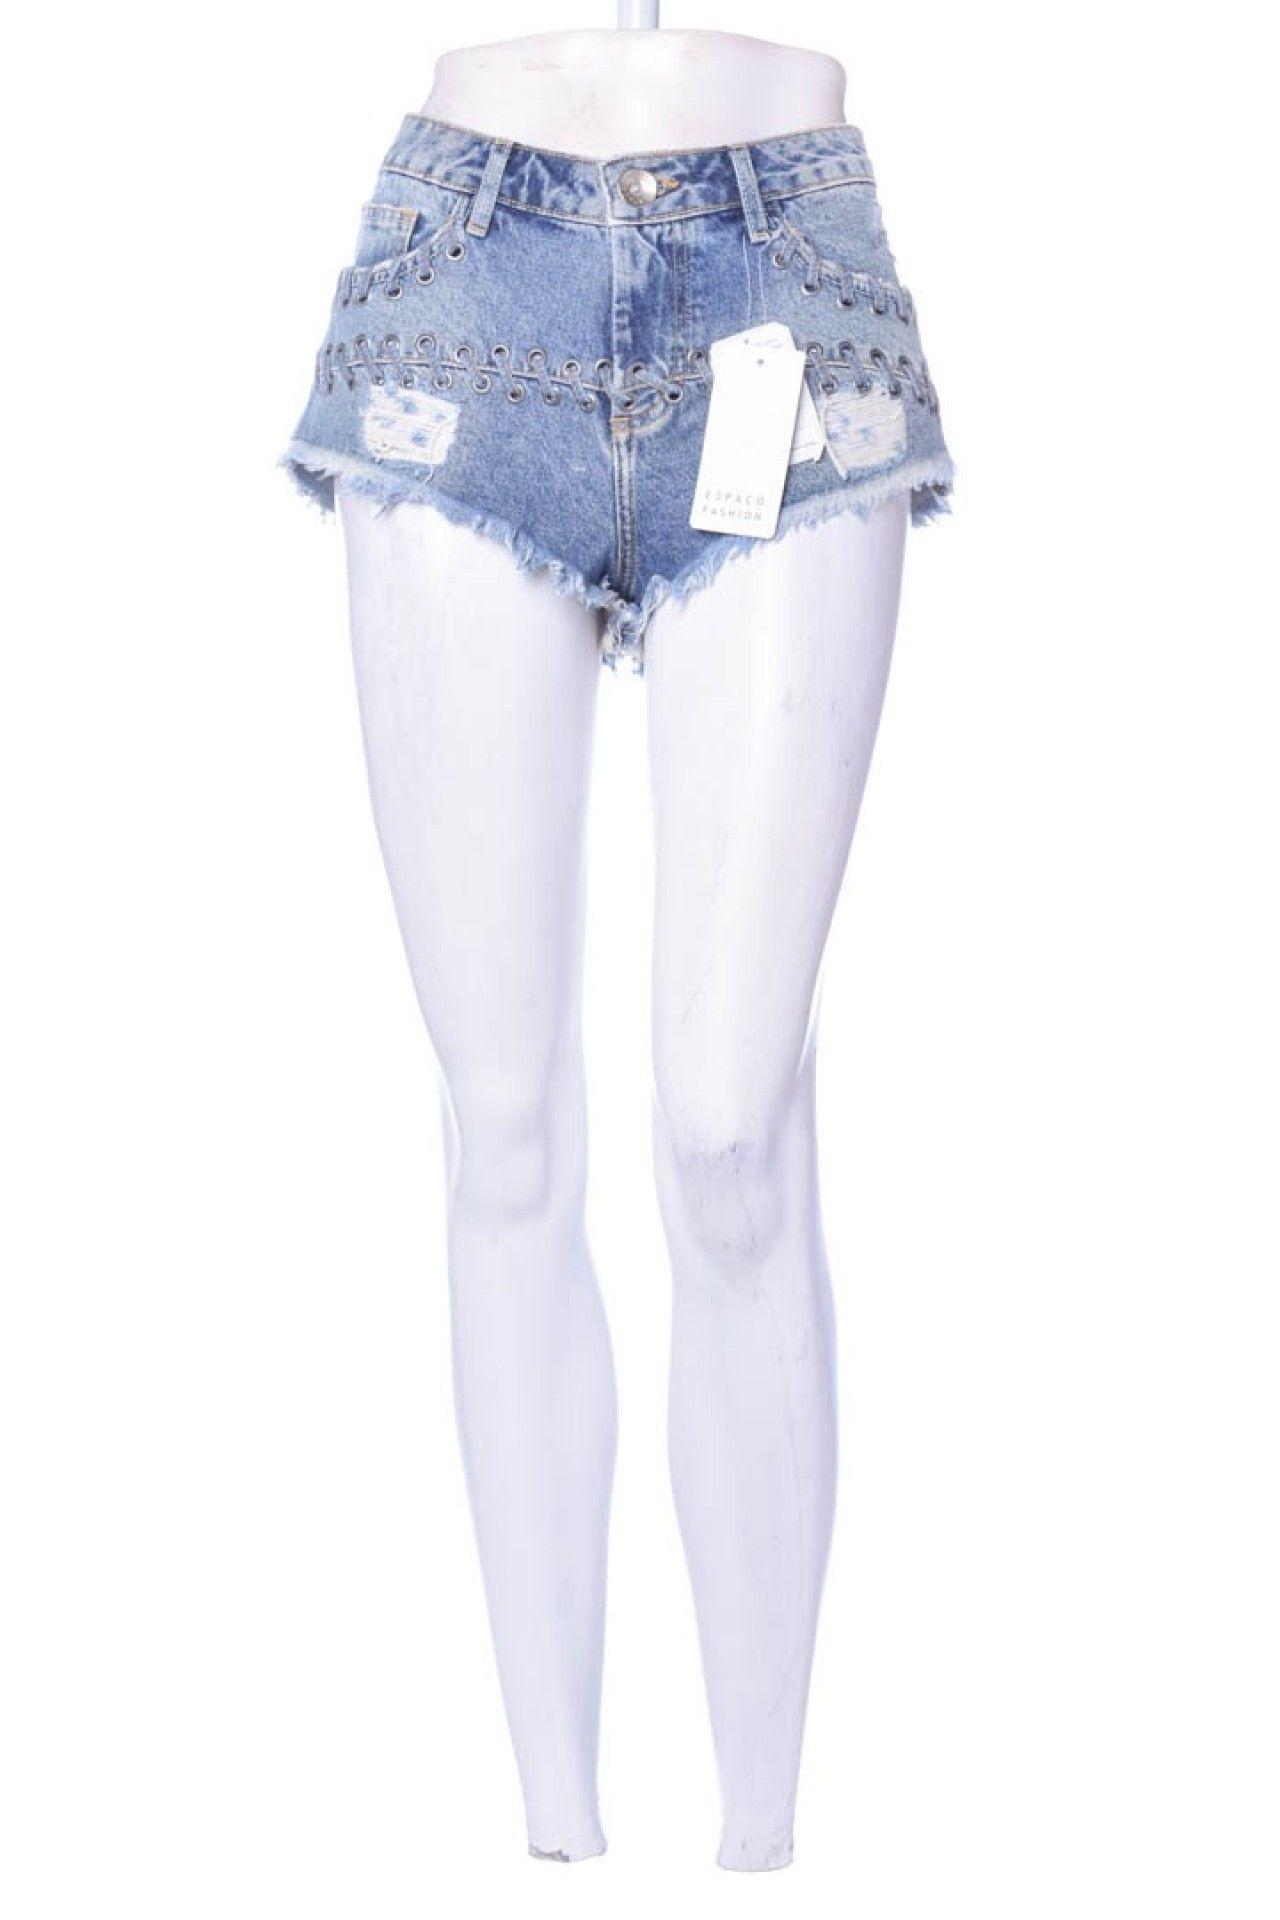 Espaço Fashion - Shorts Jeans Transpasse - Foto 1